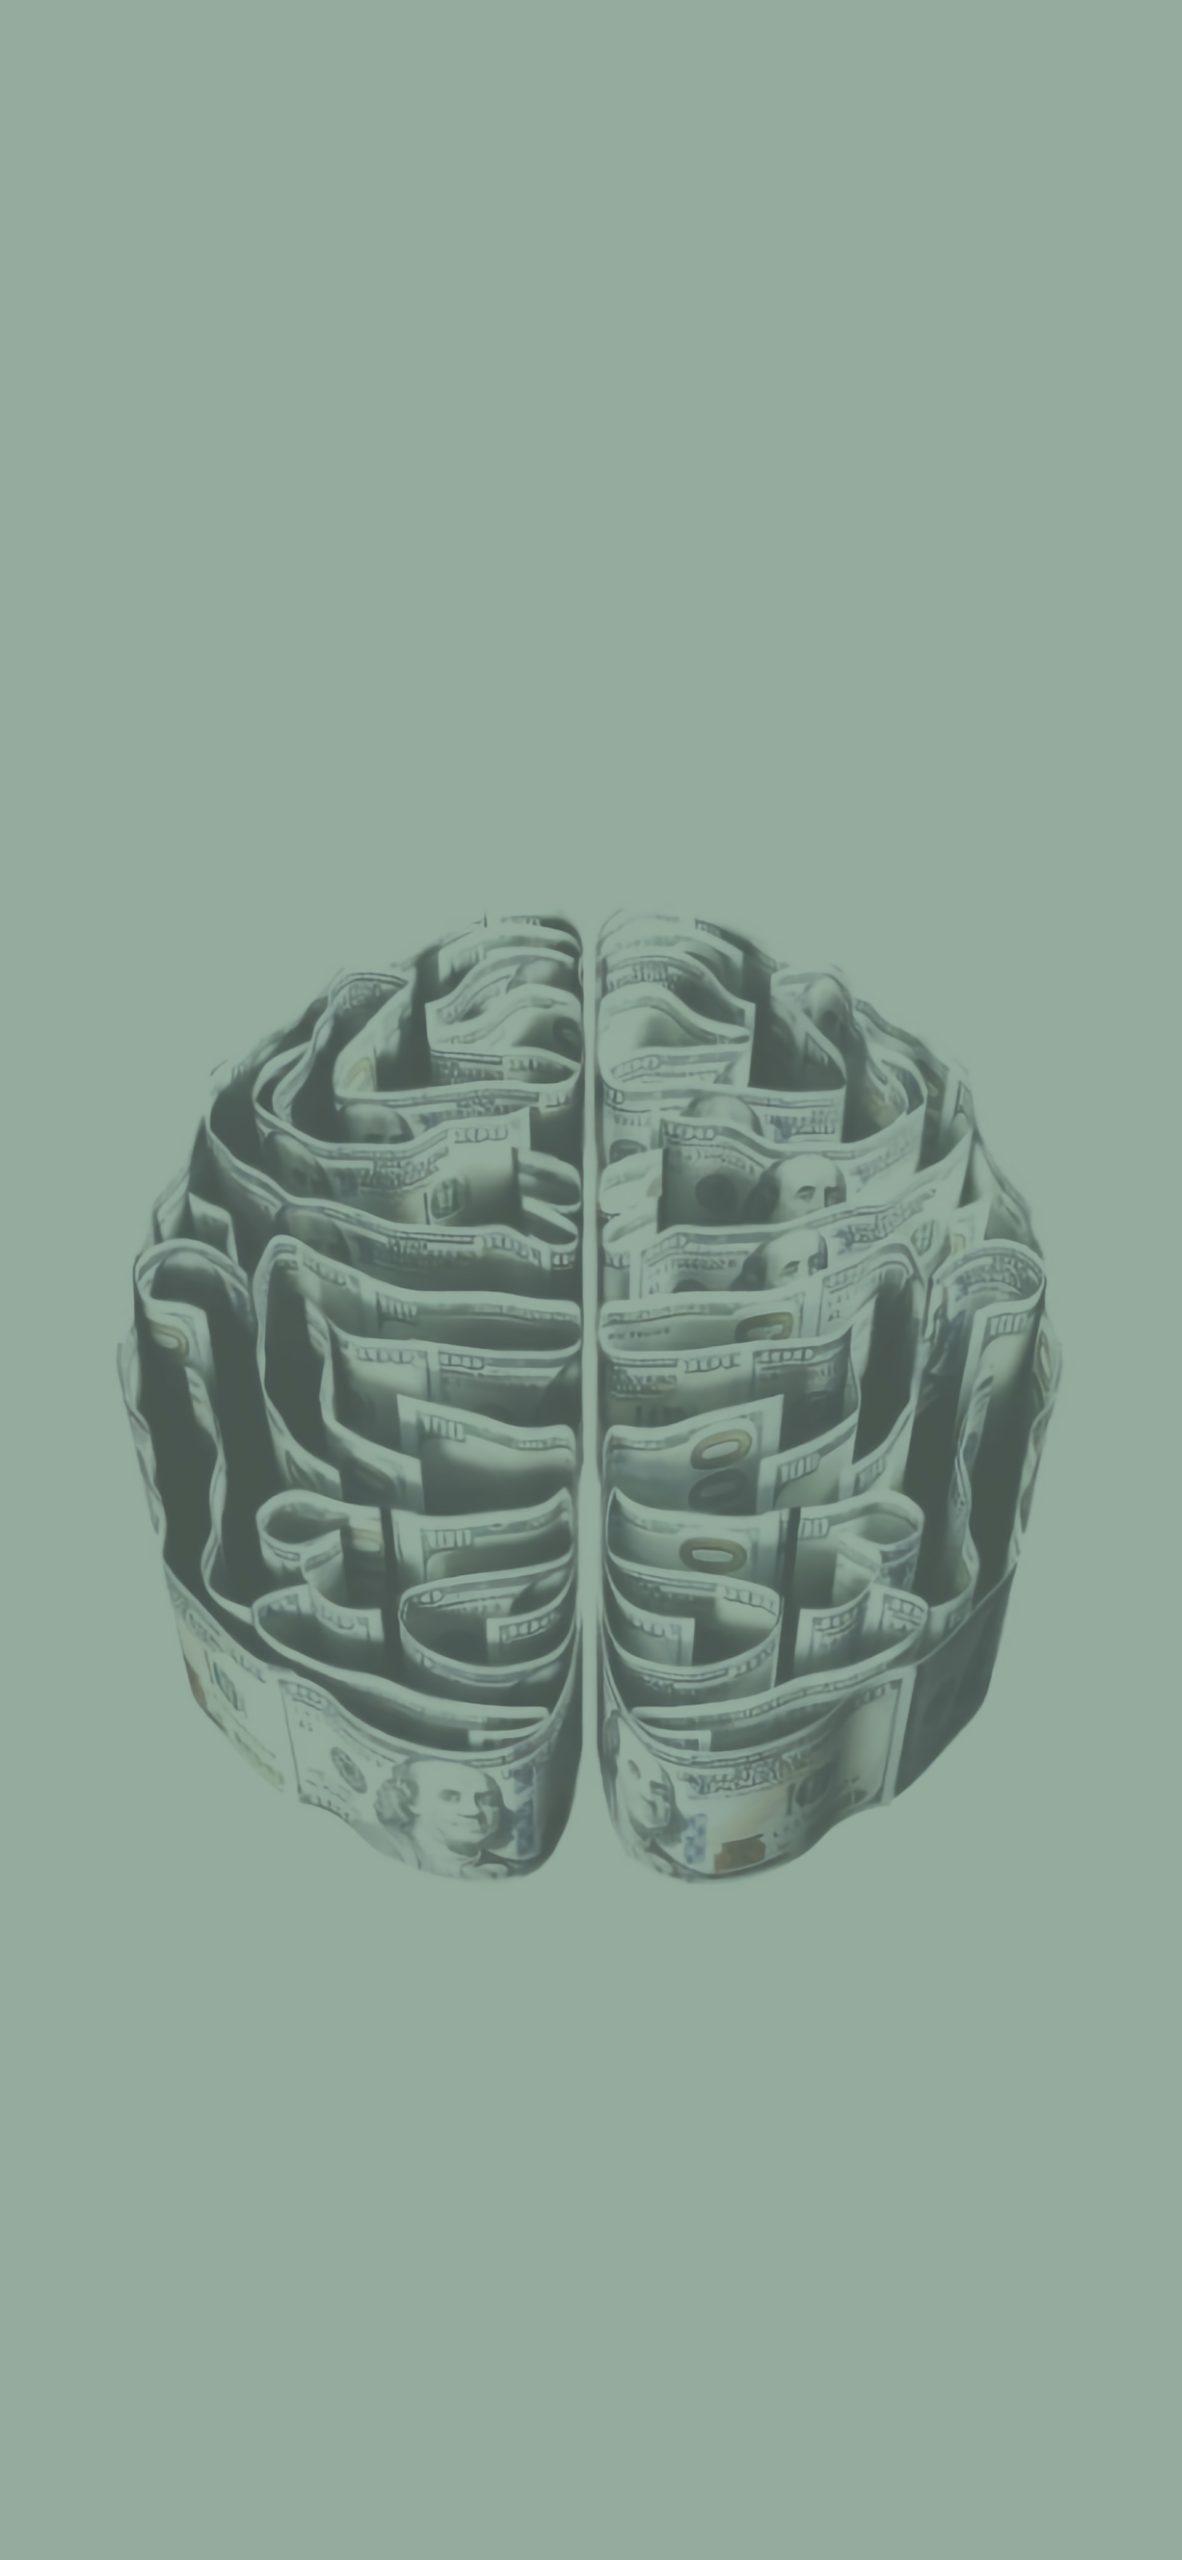 Heal Itself Brain Damage Article Image